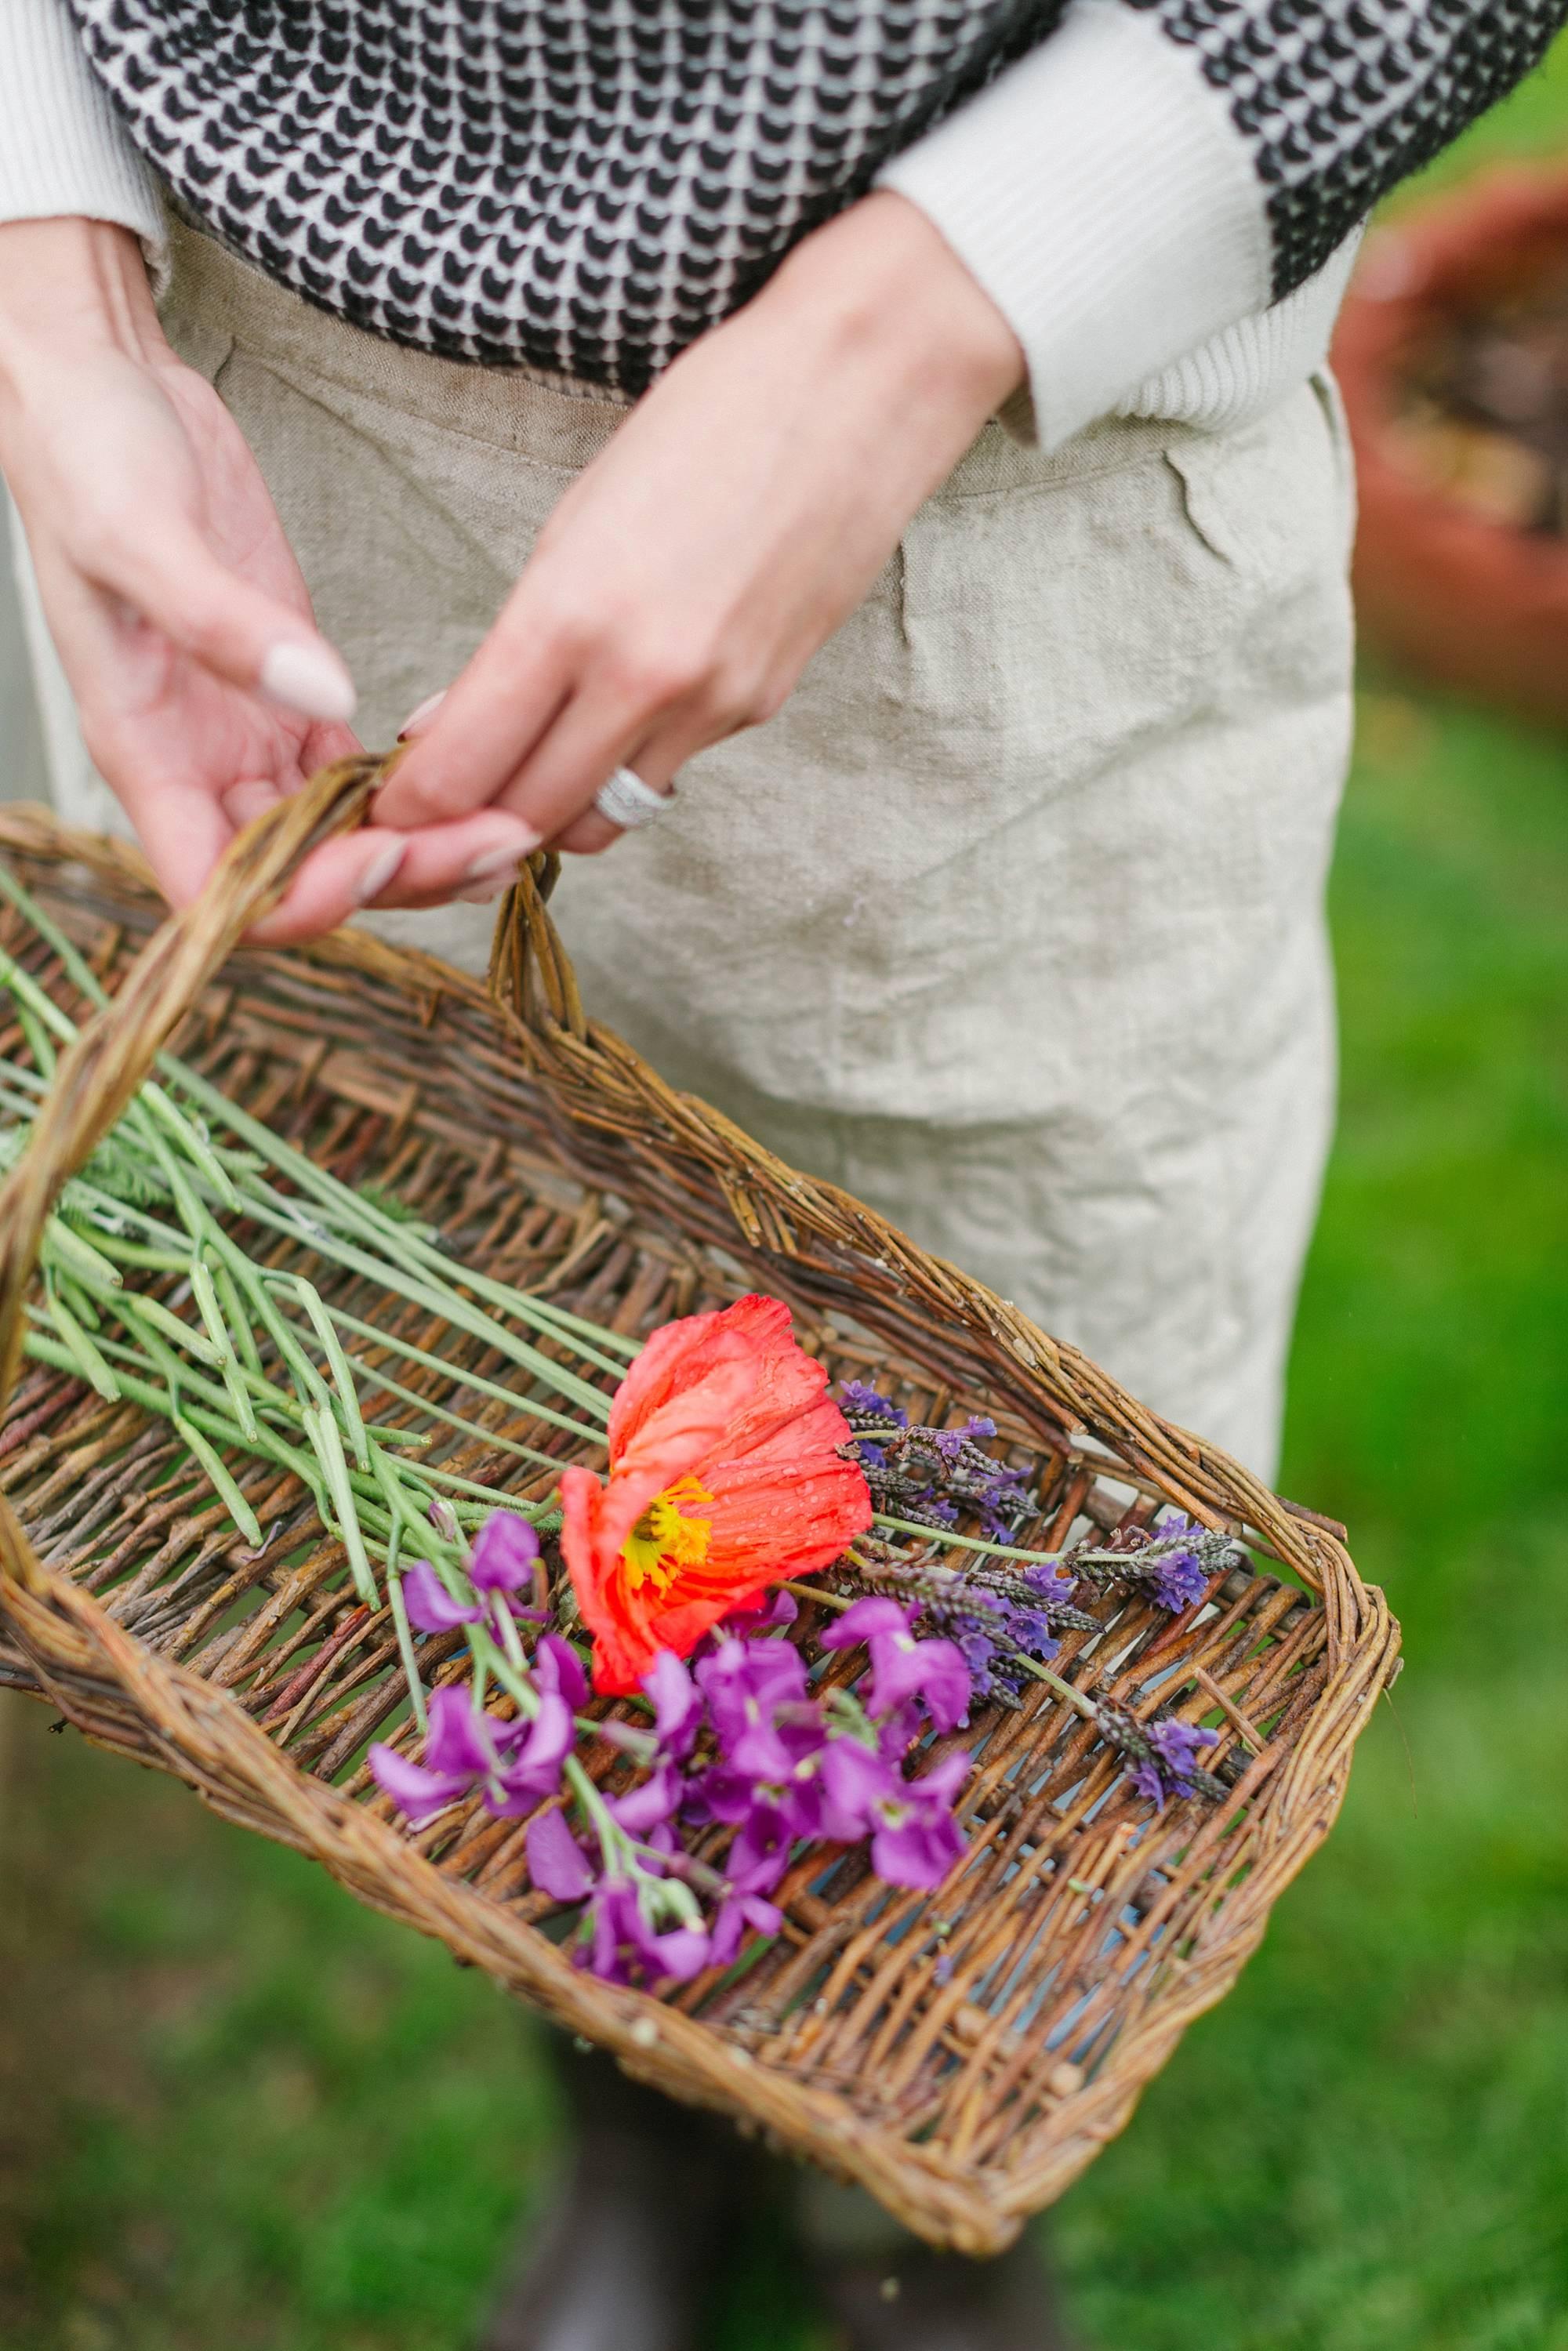 rainy day garden goods gathering lifestyle blogger Diana Elizabeth #gardenblog #garden